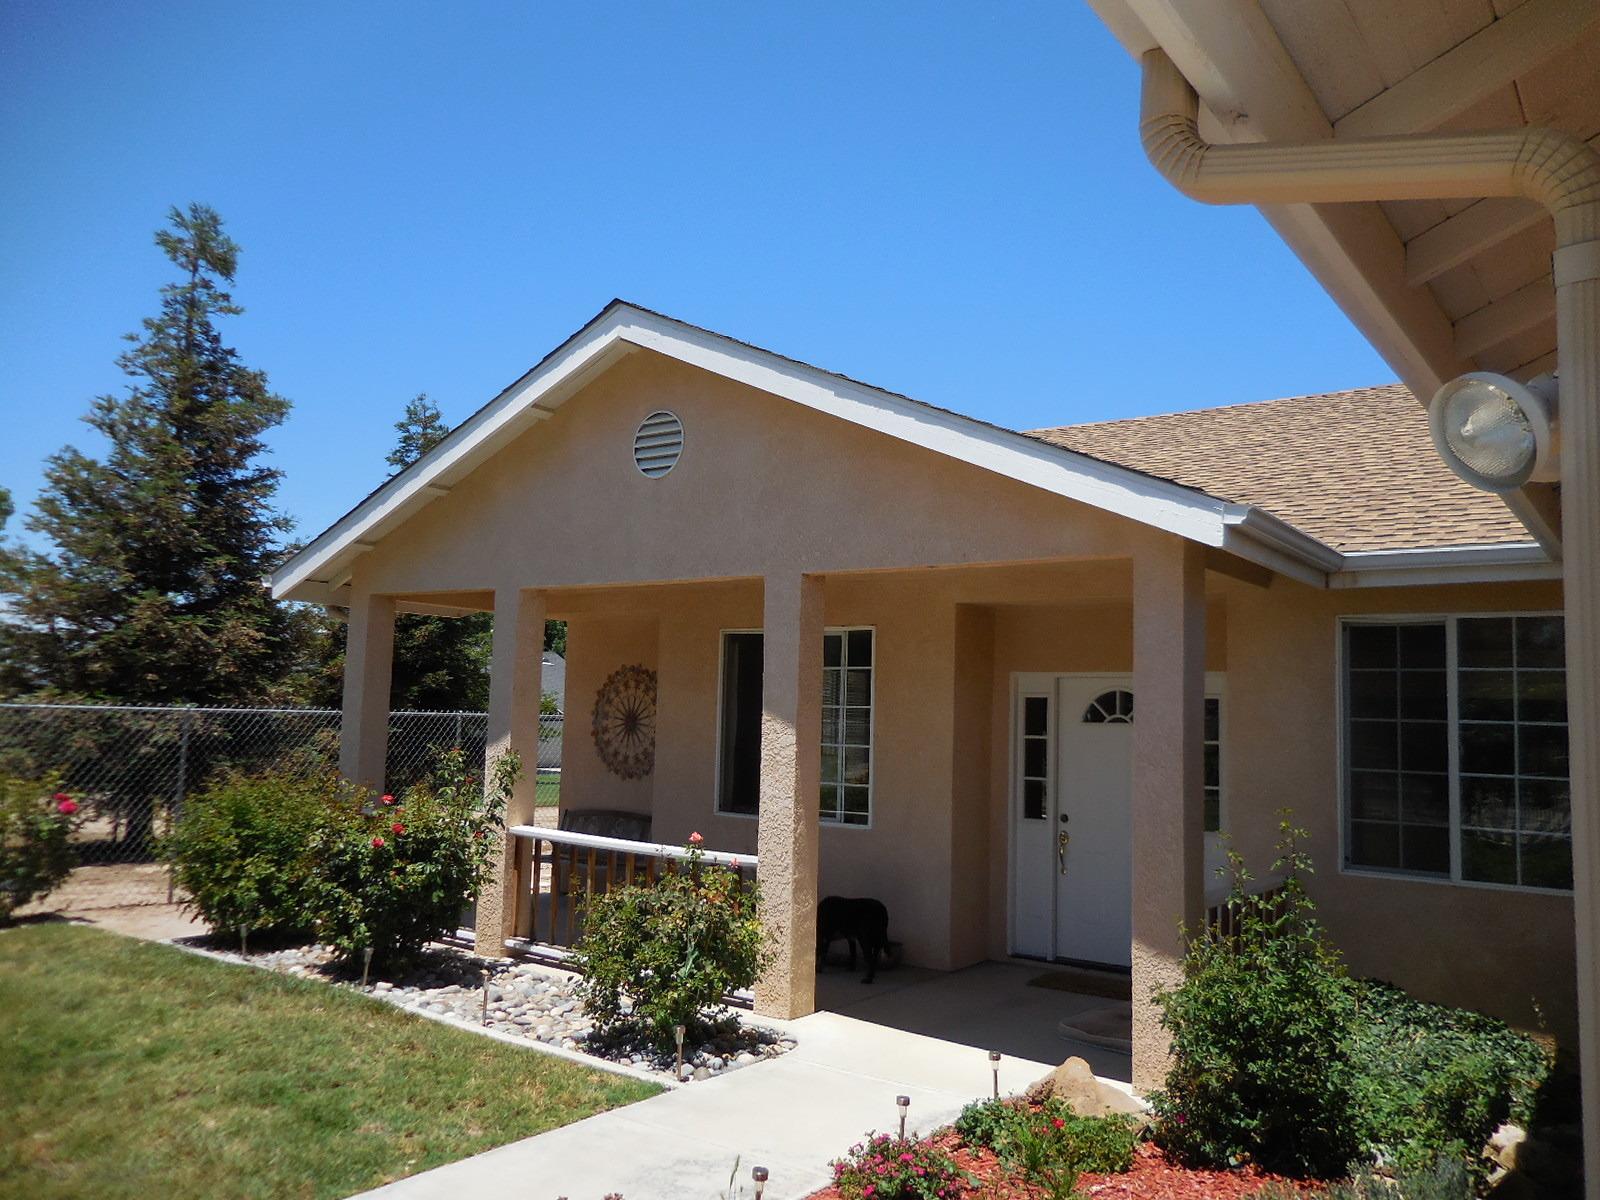 3 bedroom 2 bath arroyo grande homes for sale listings